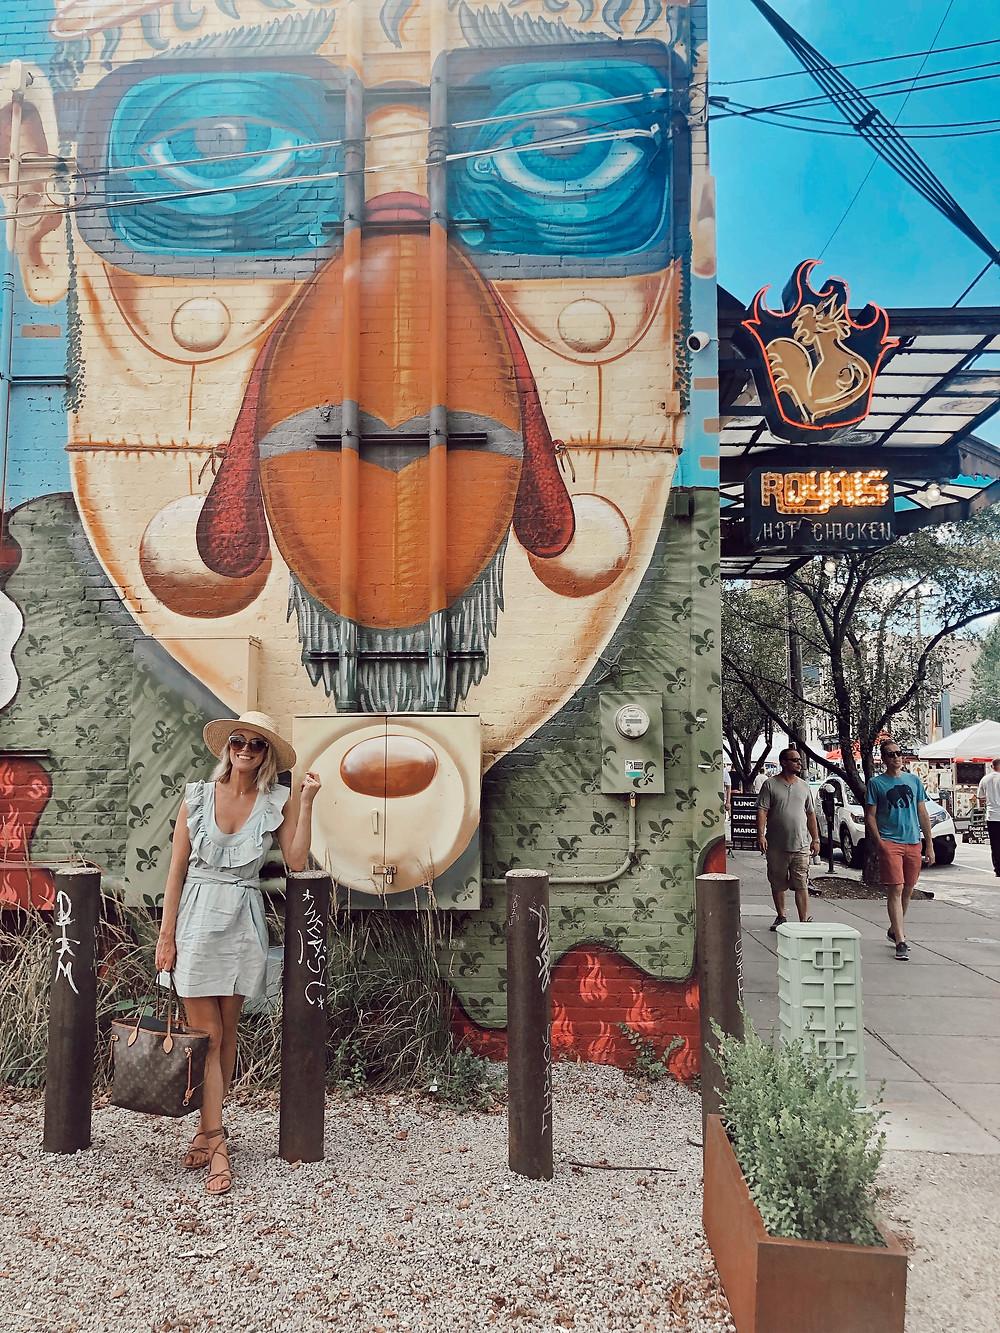 Royals Hot Chicken wall mural, fried chicken, Bourbon Trail travel guide, where to eat in Louisville, best restaurants, travel blog